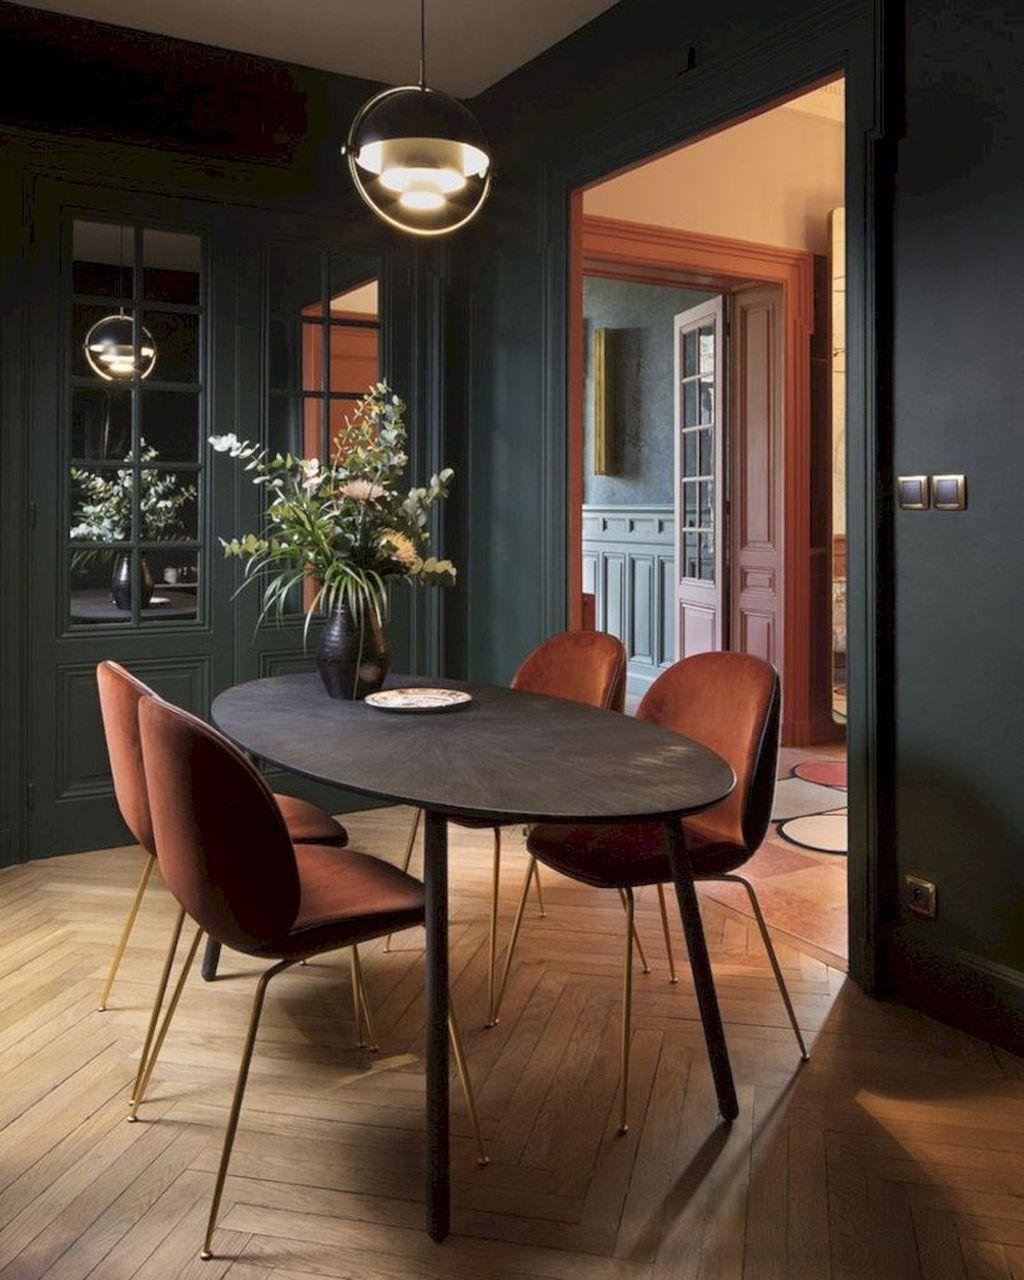 Admirable Dining Room Design Ideas 14